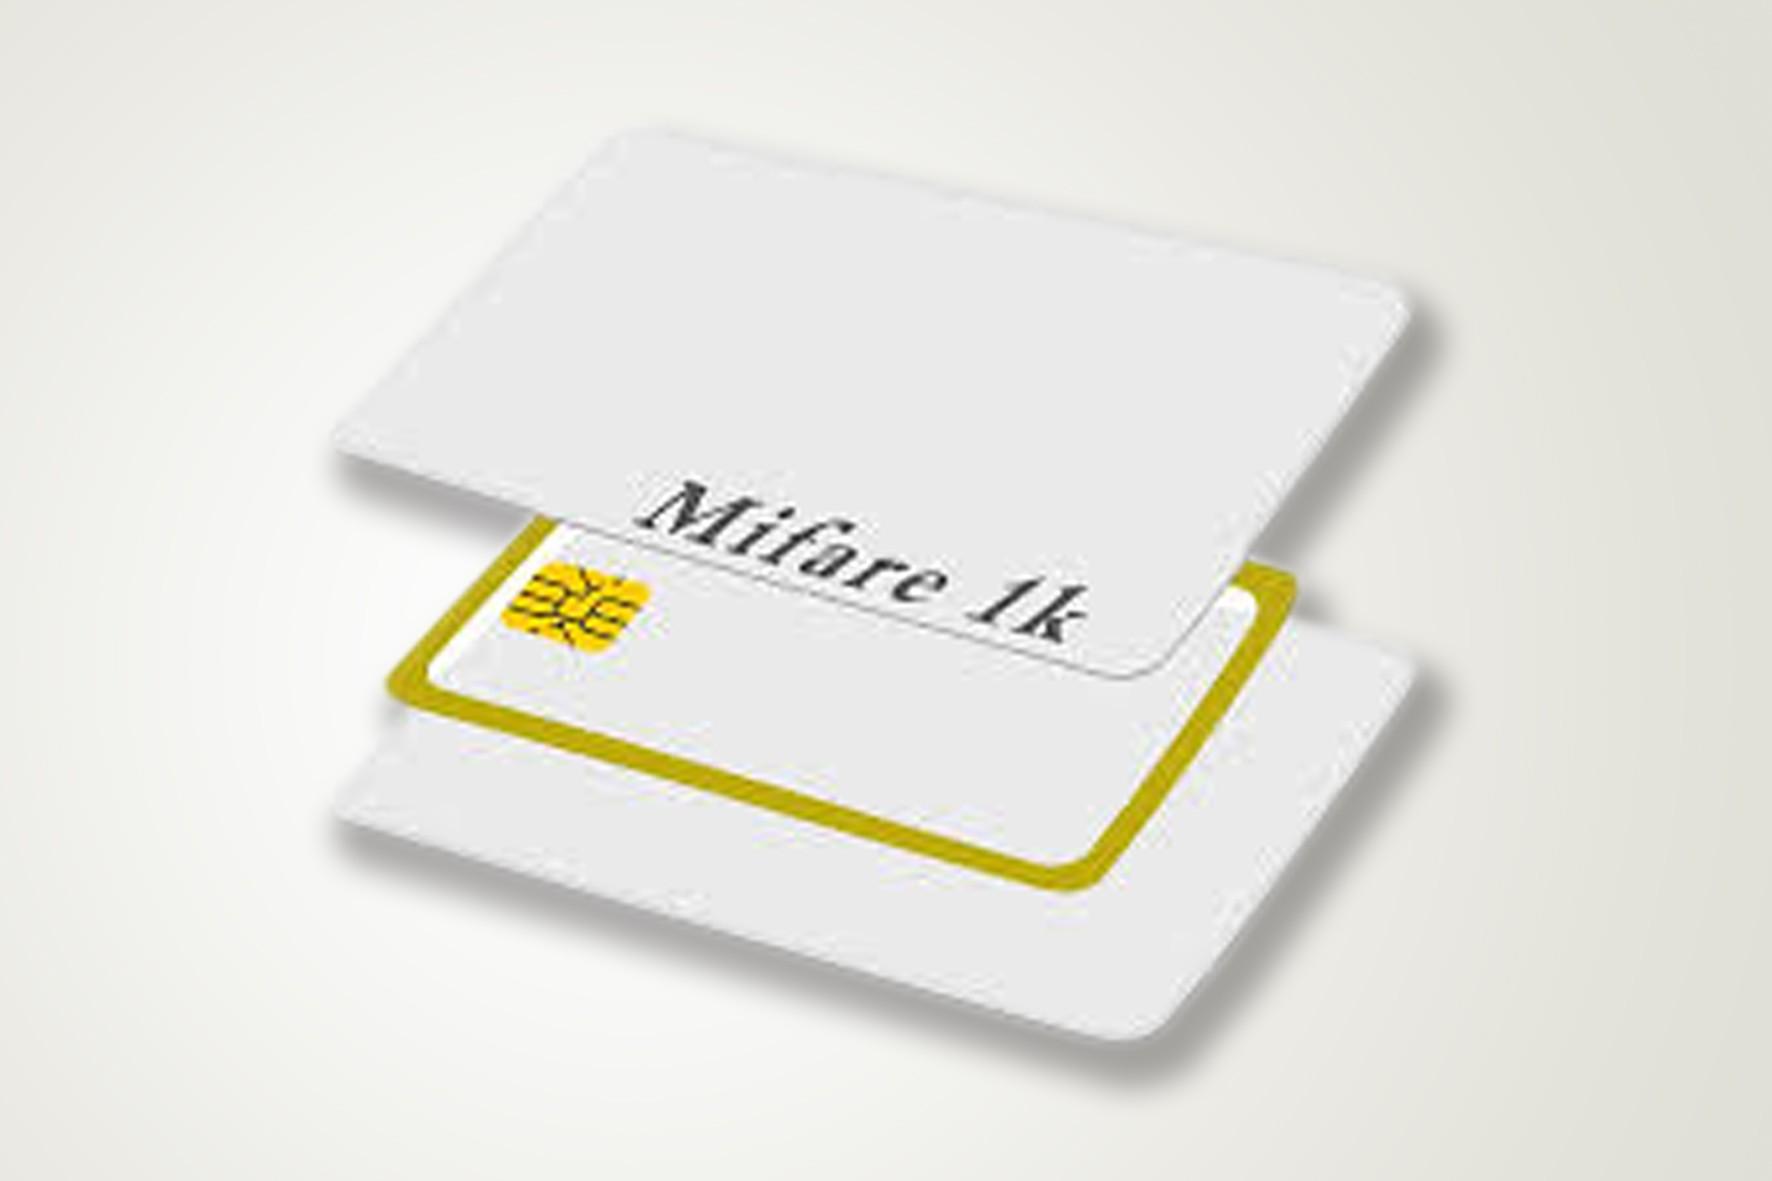 Cartões Mifare no Jardim Bom Pastor - Cardápio de Plástico